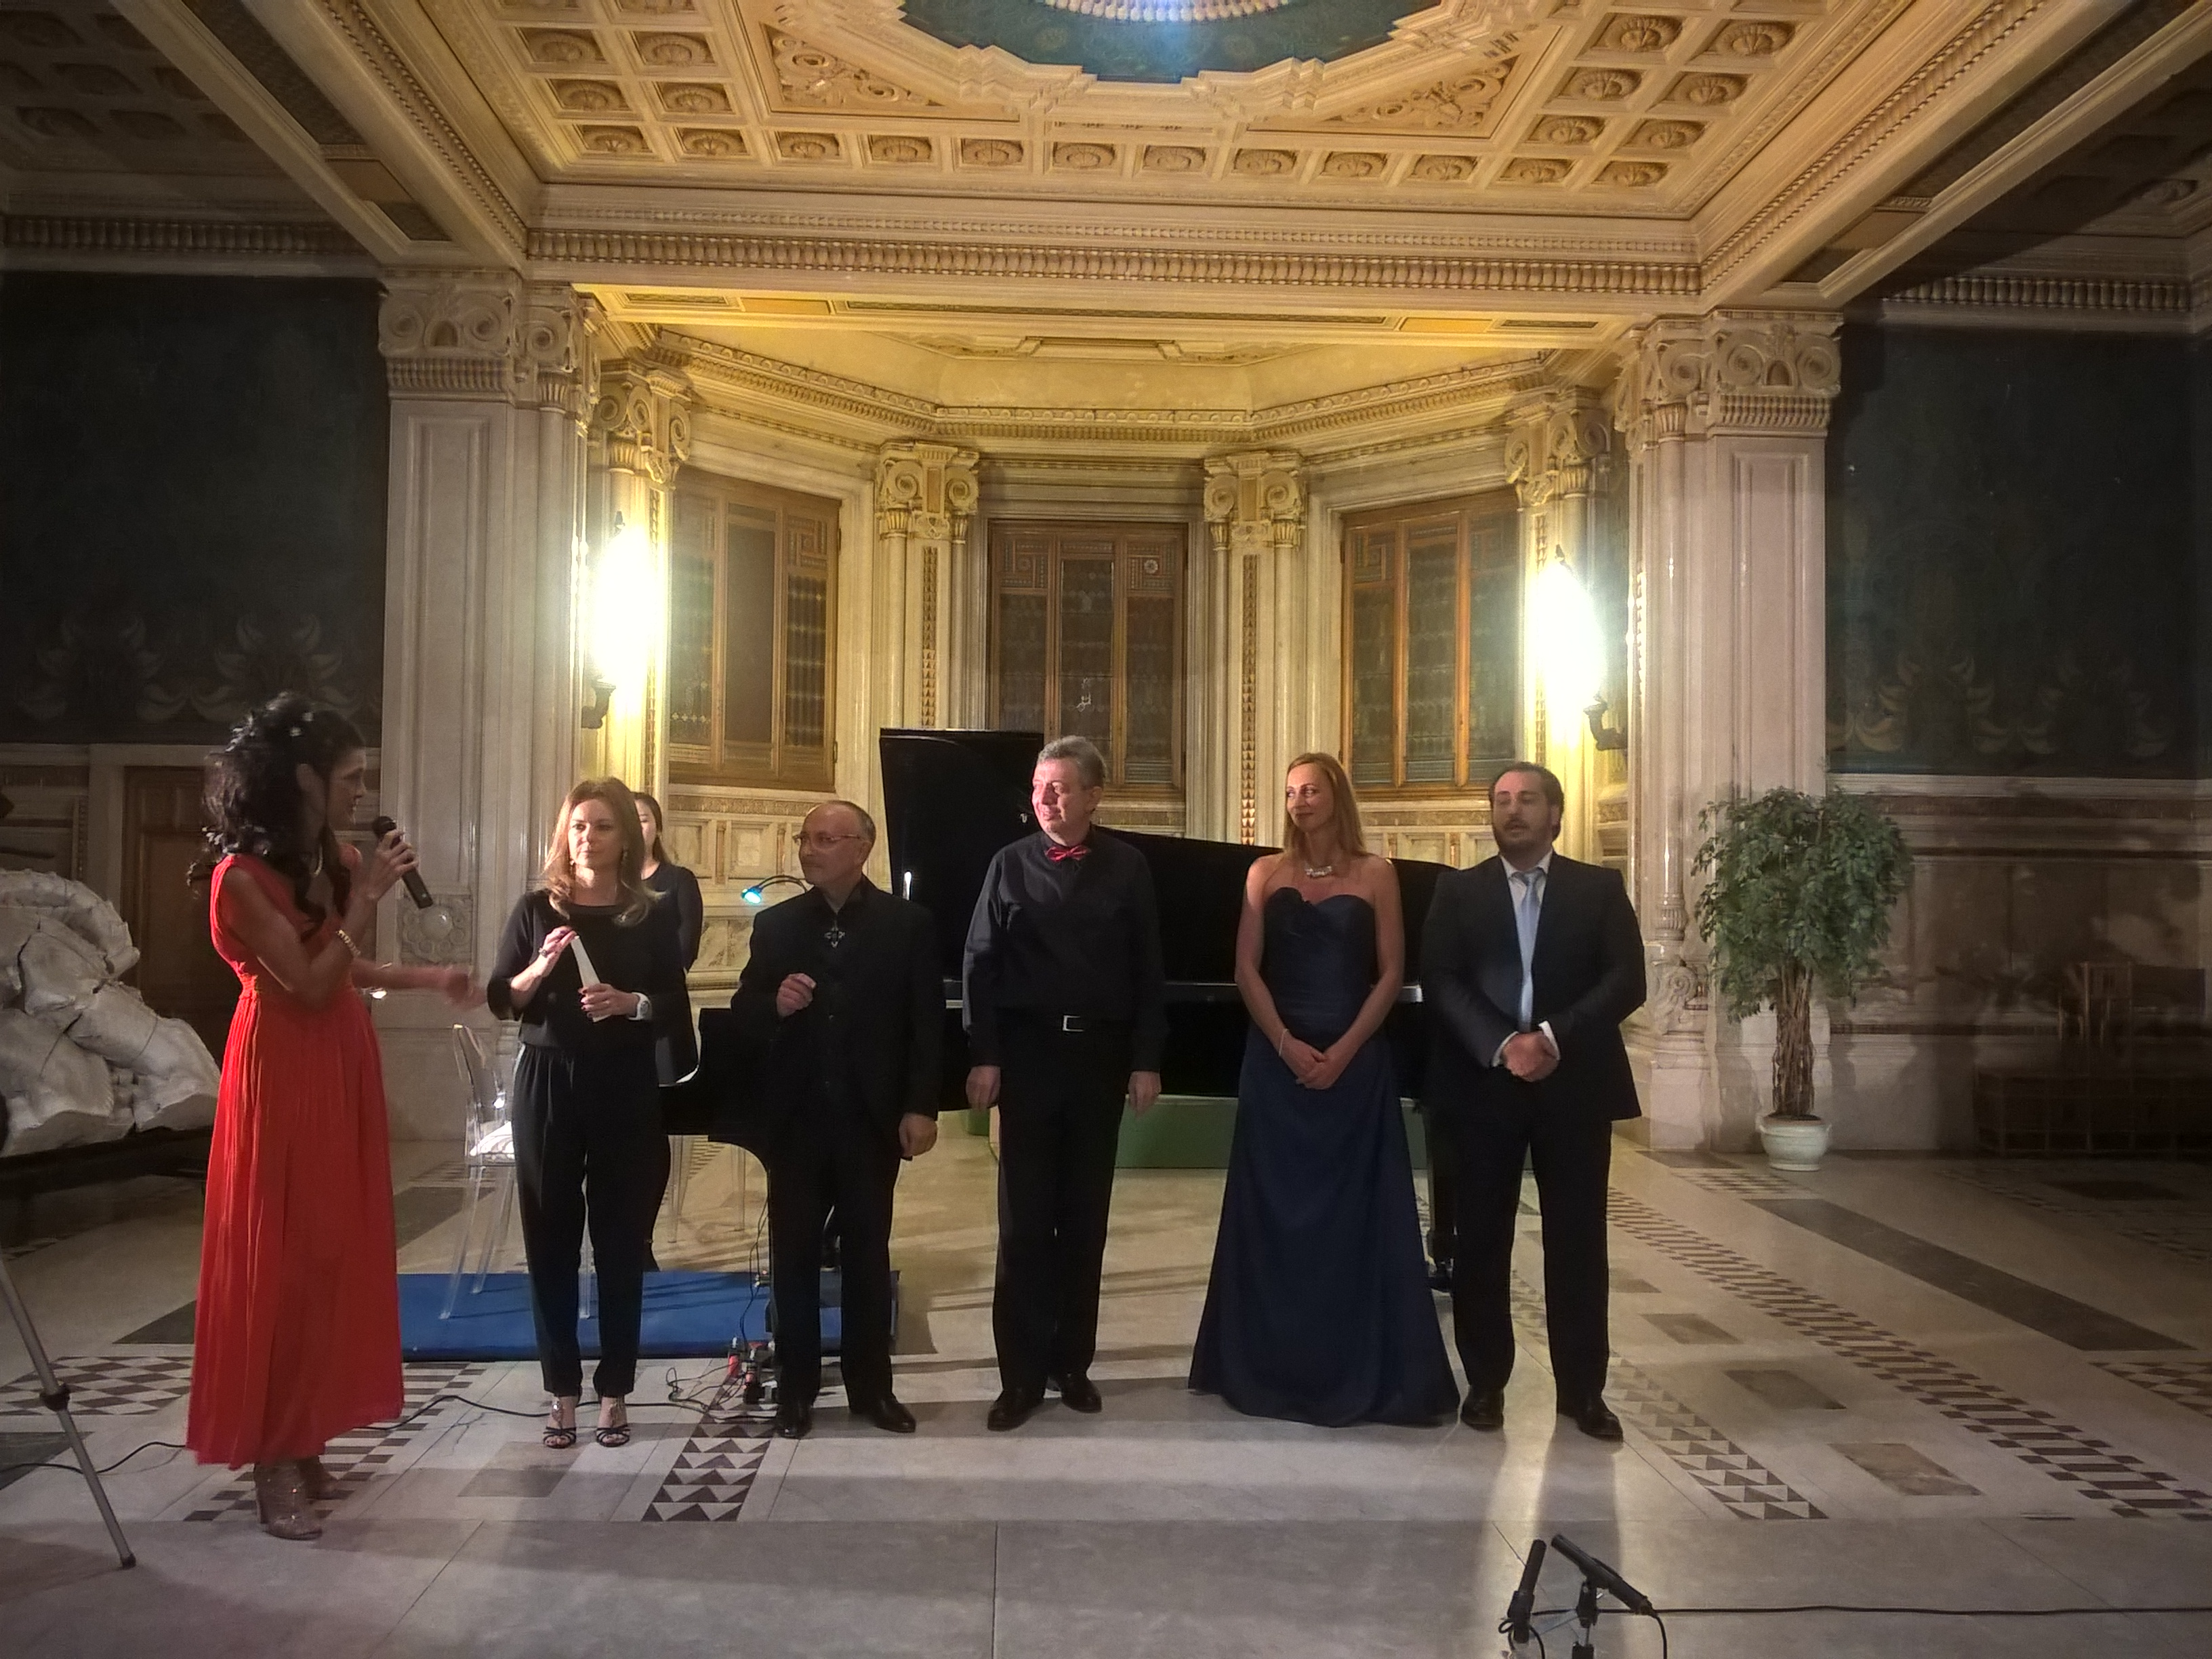 Katia Lanzi, Ilaria Notari,Sergio Bologna, Raffaele Cortesi. Gabrielle Mouhlen, Alberto Profeta. Ph P. Monteverdi